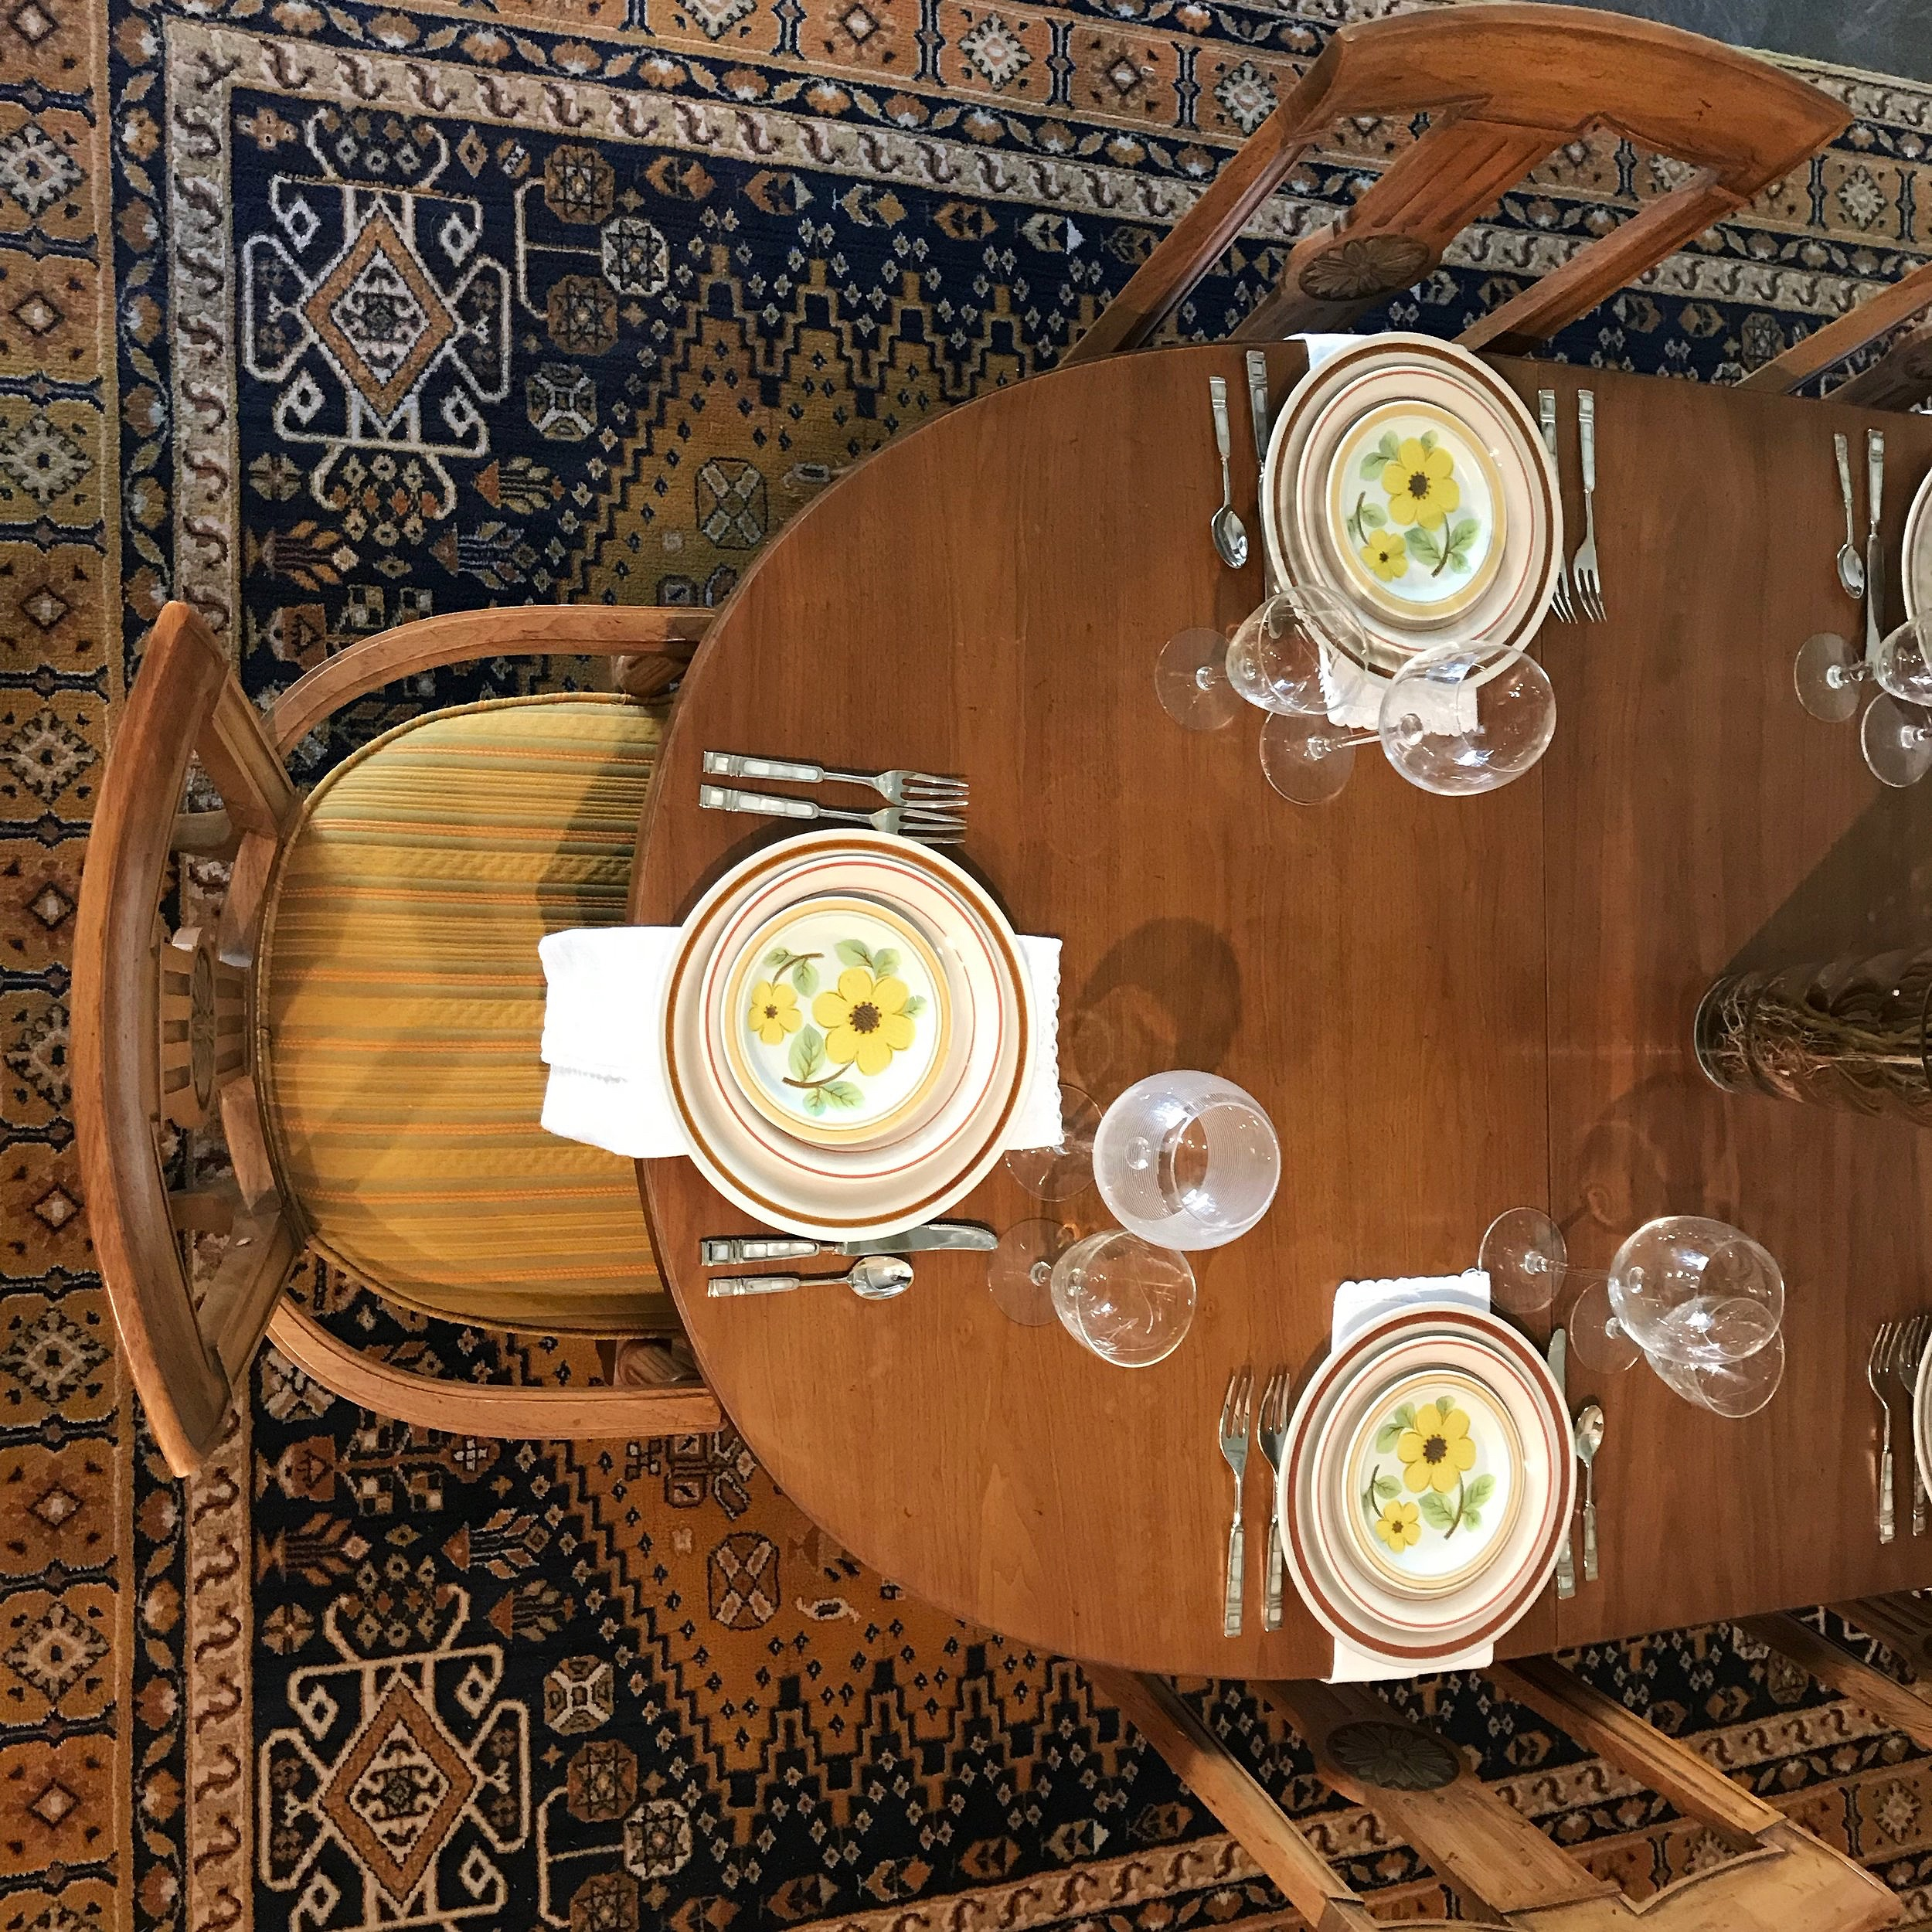 Birdseye View of MCM Dining Room